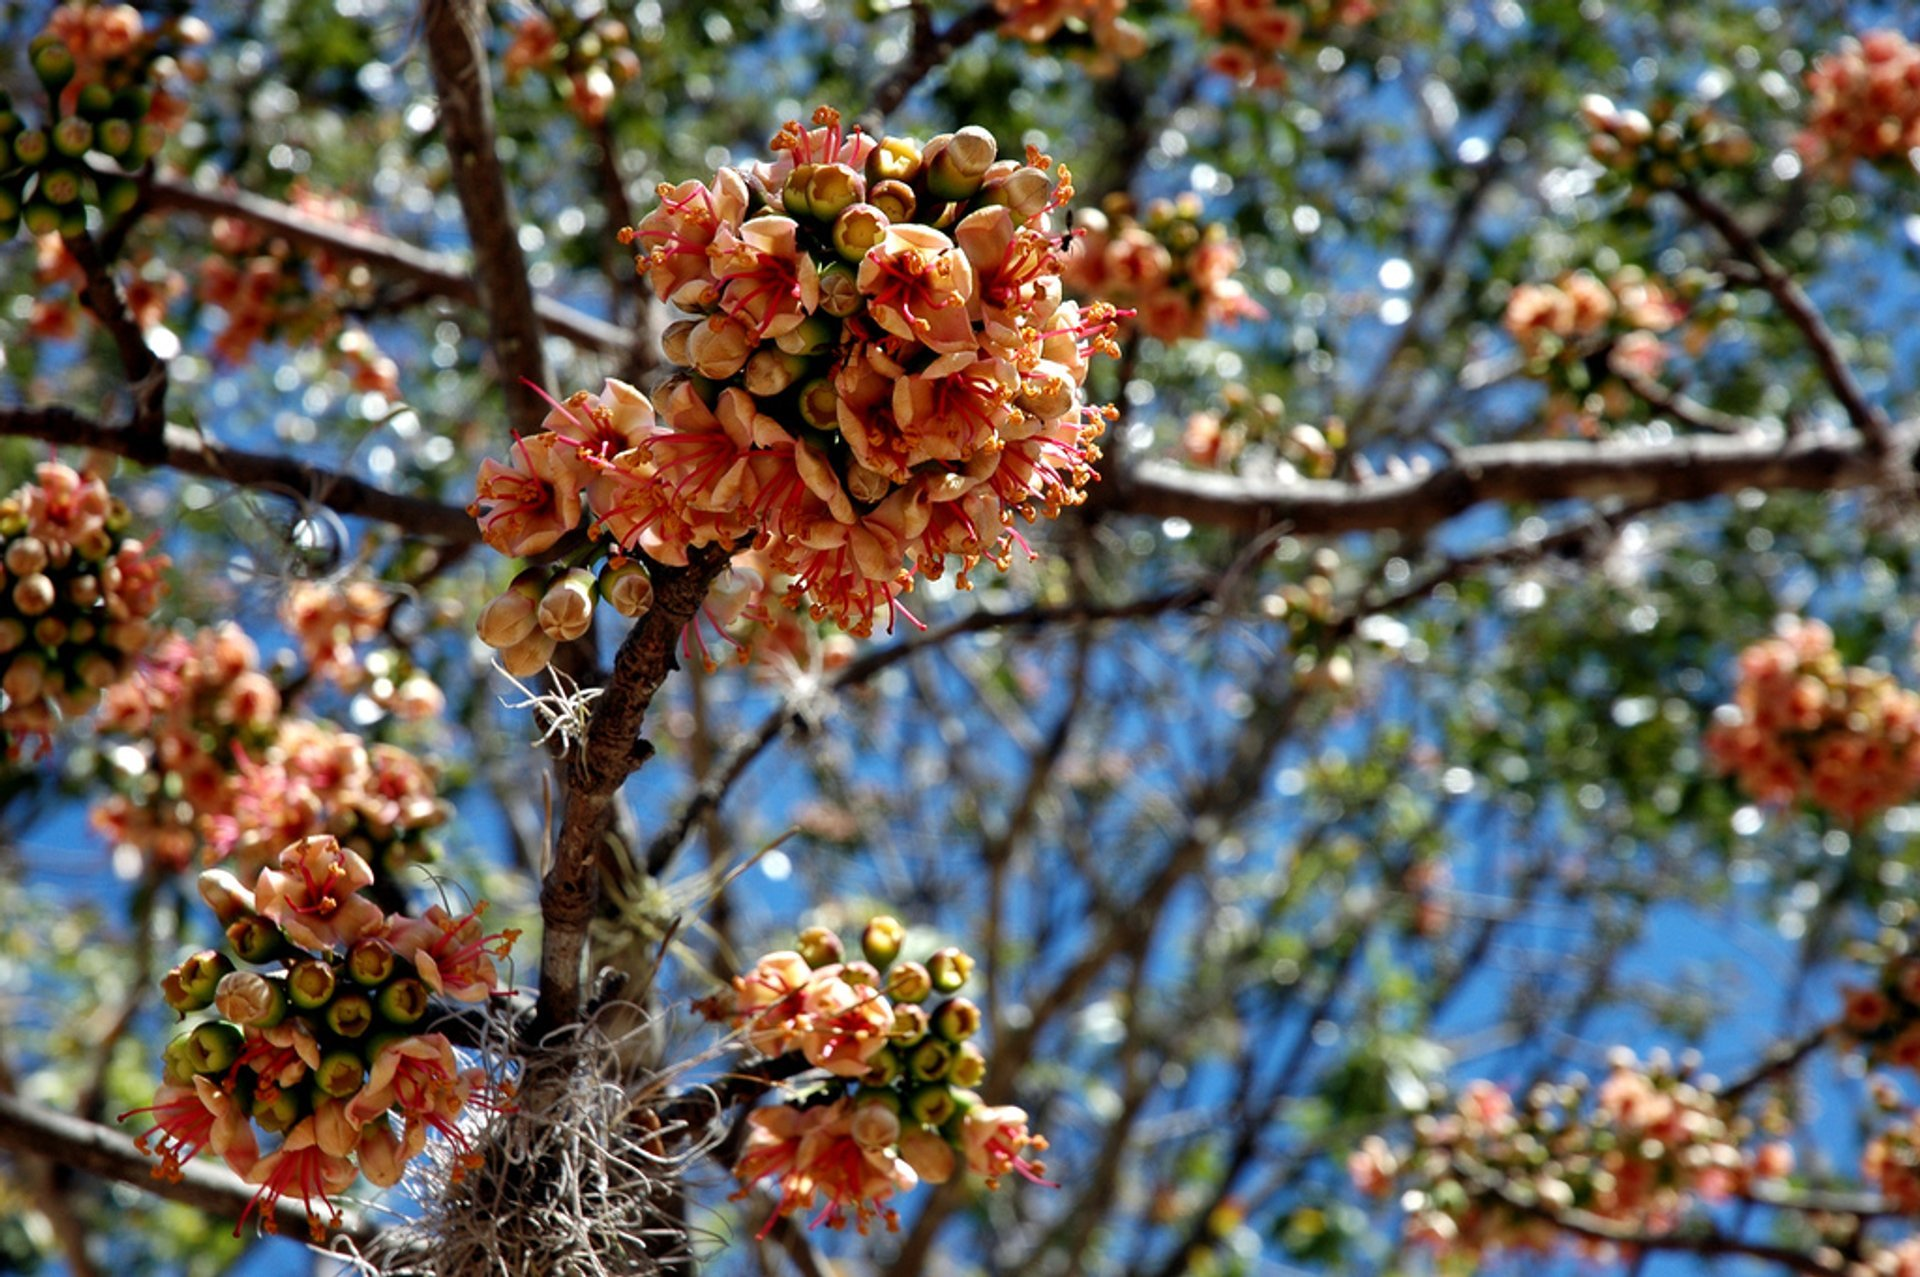 Ceiba Trees in Bloom in Guatemala - Best Season 2019